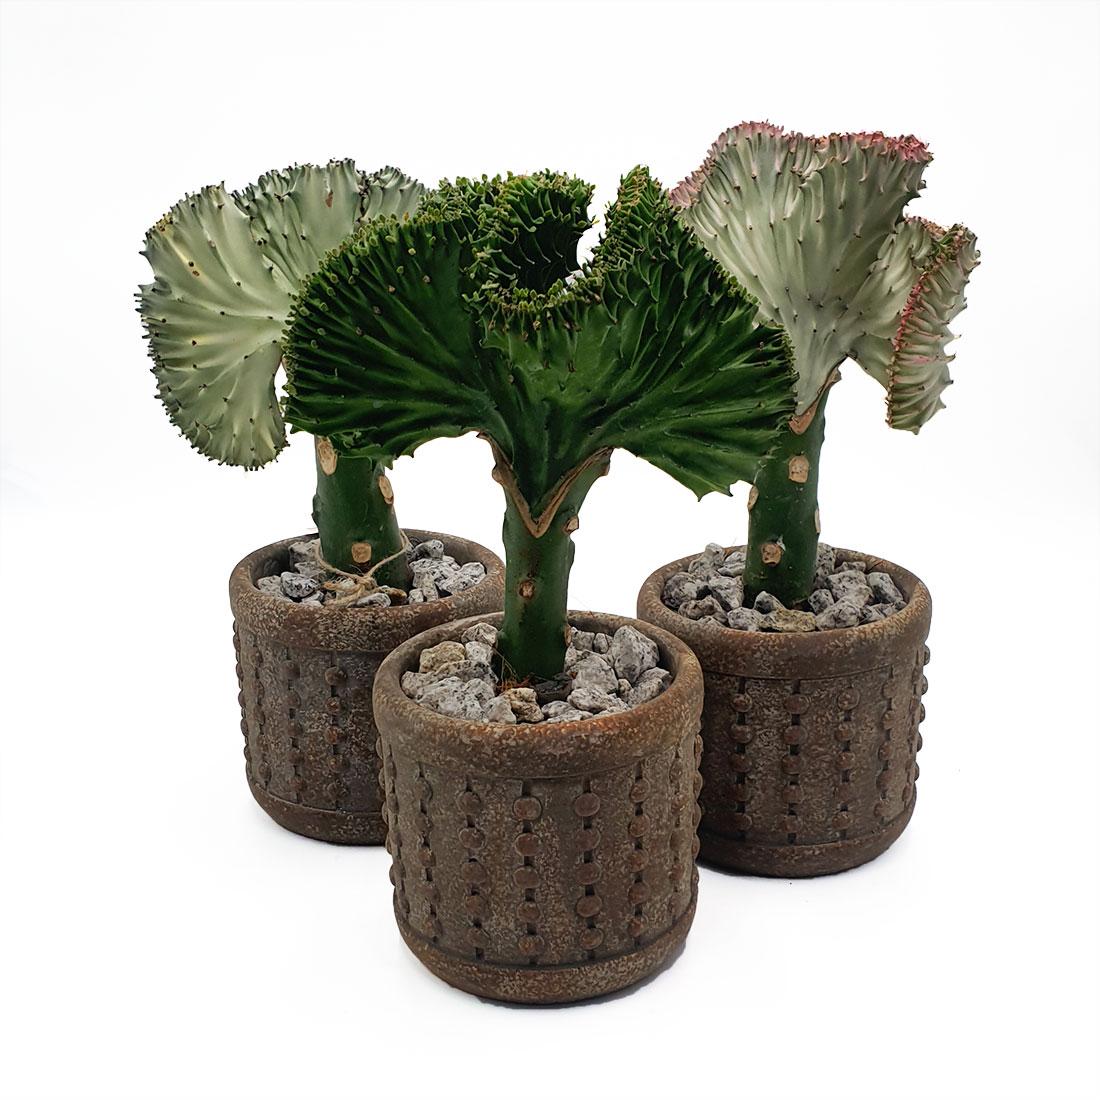 "Vazoninis augalas EUPHORBIA LACTEA ""CRISTATA"", su vazonu"